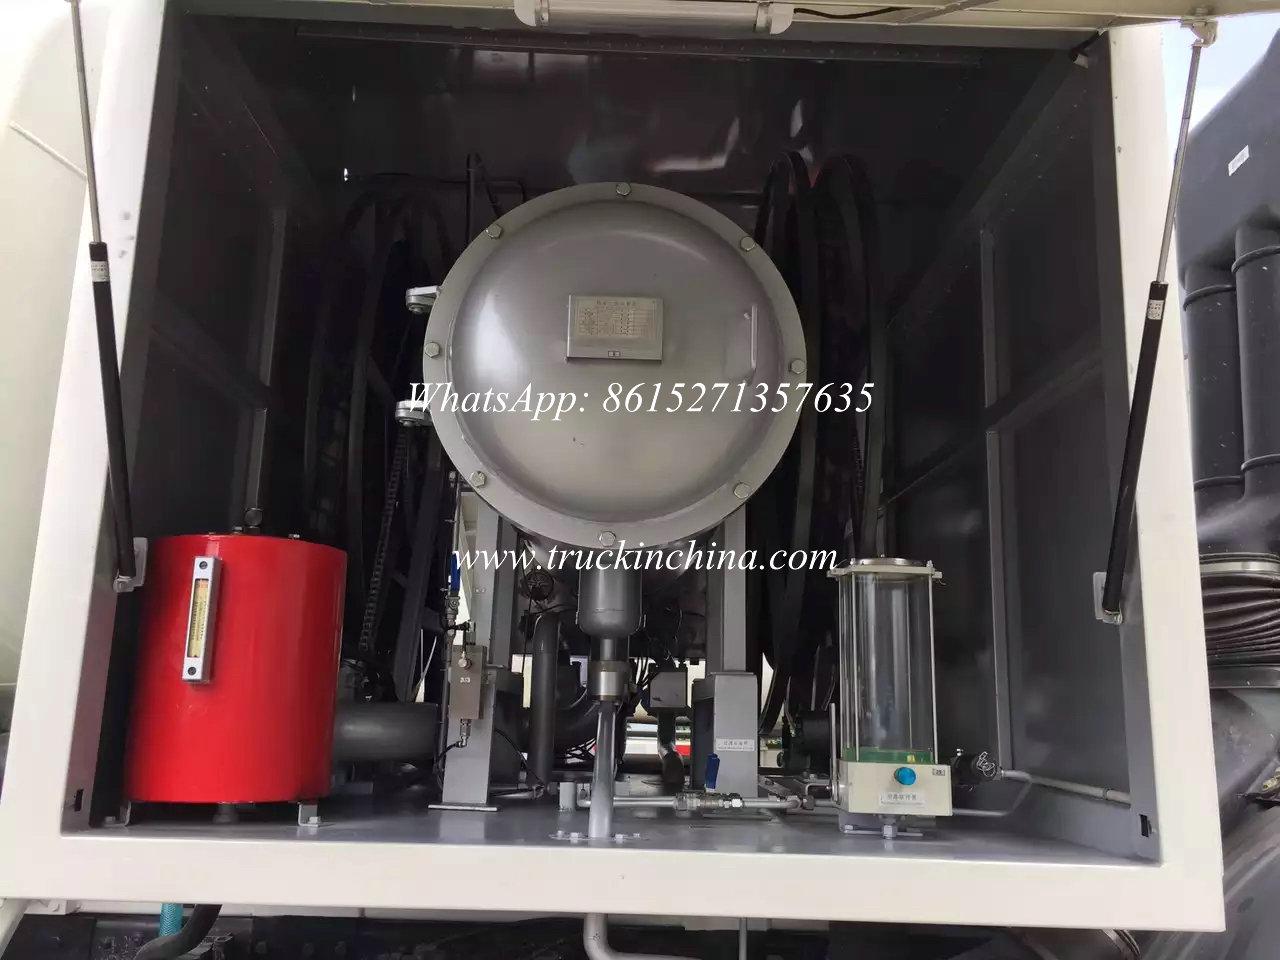 beiben aircaft fueler2016-06-08-215746- beiben aircaft fueler Tanker_0003